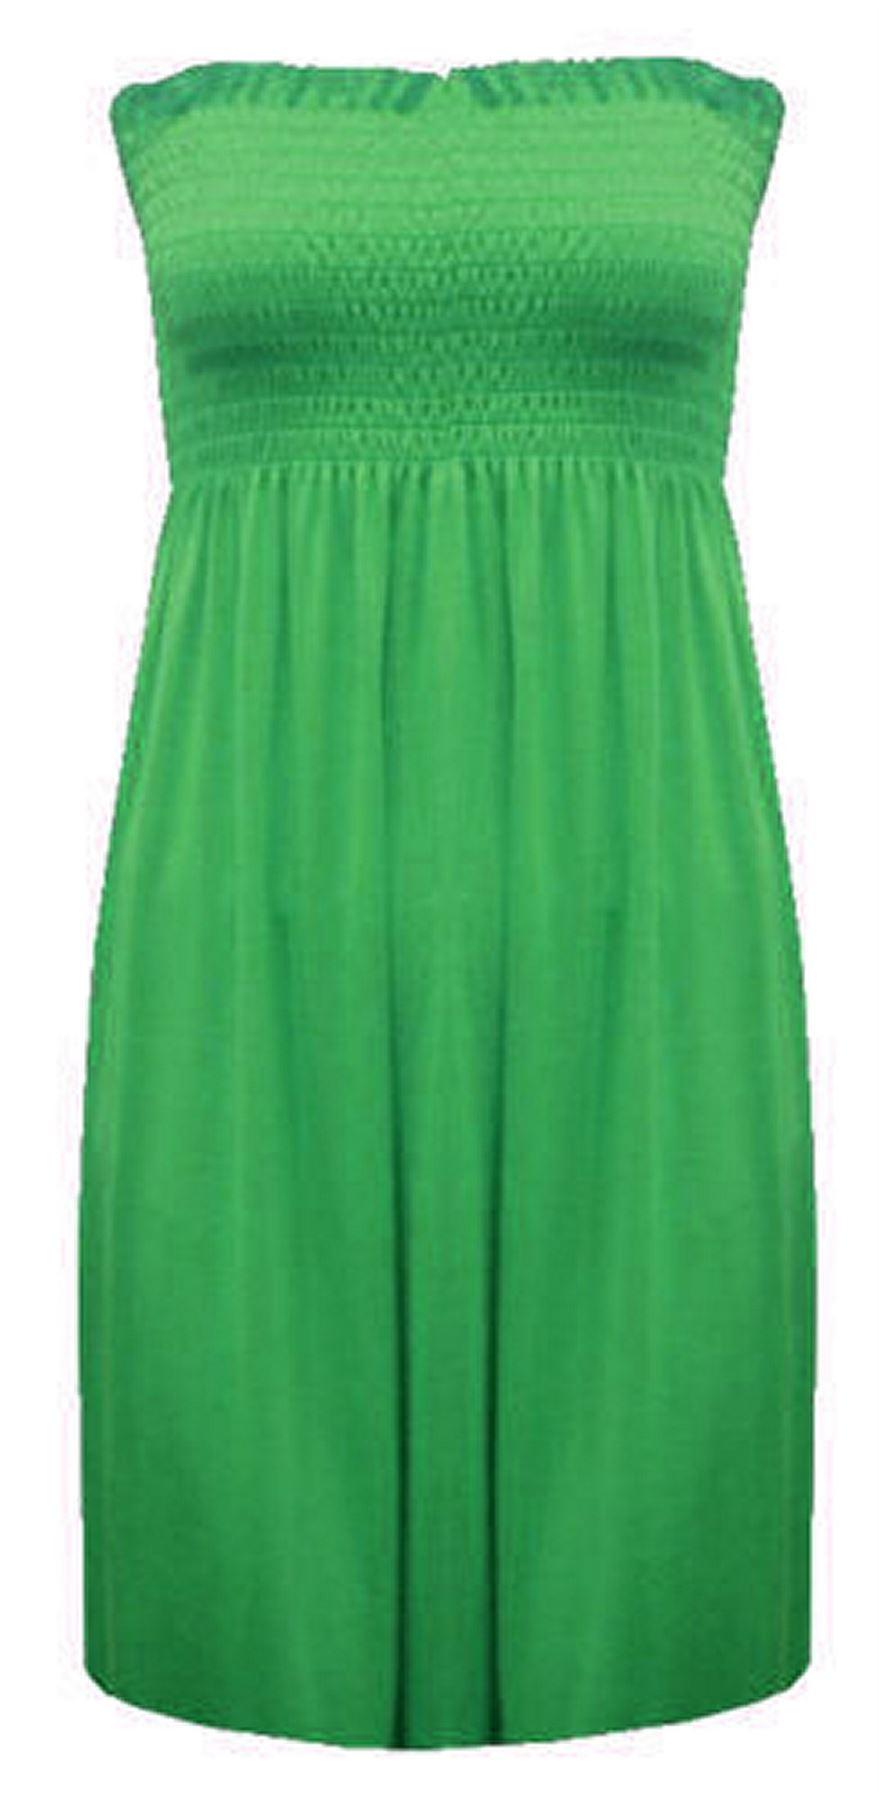 New-Ladies-Bandeau-Boob-Gathering-Tops-Boob-Tube-Beach-Wear-Tunics-8-26 thumbnail 34